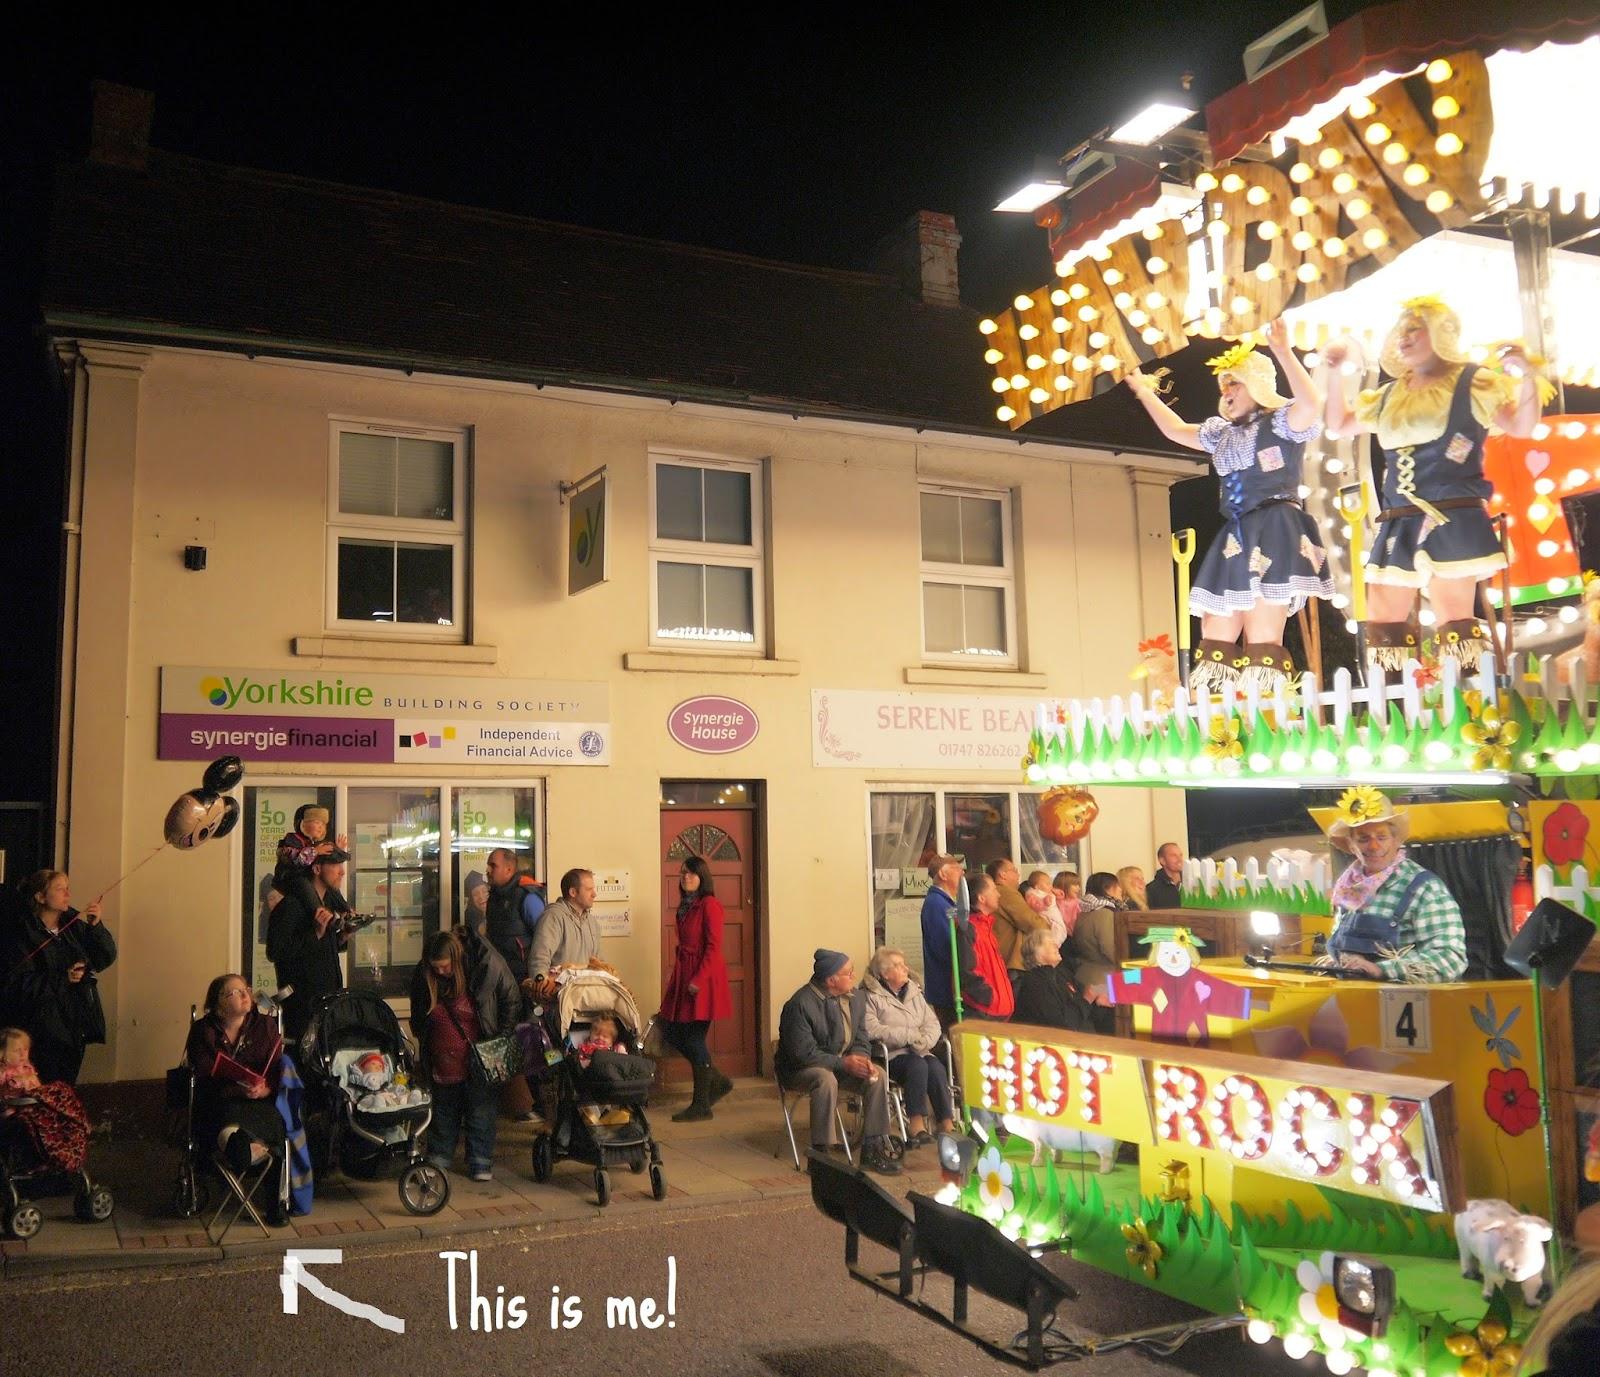 Judging Gillingham Carnival procession